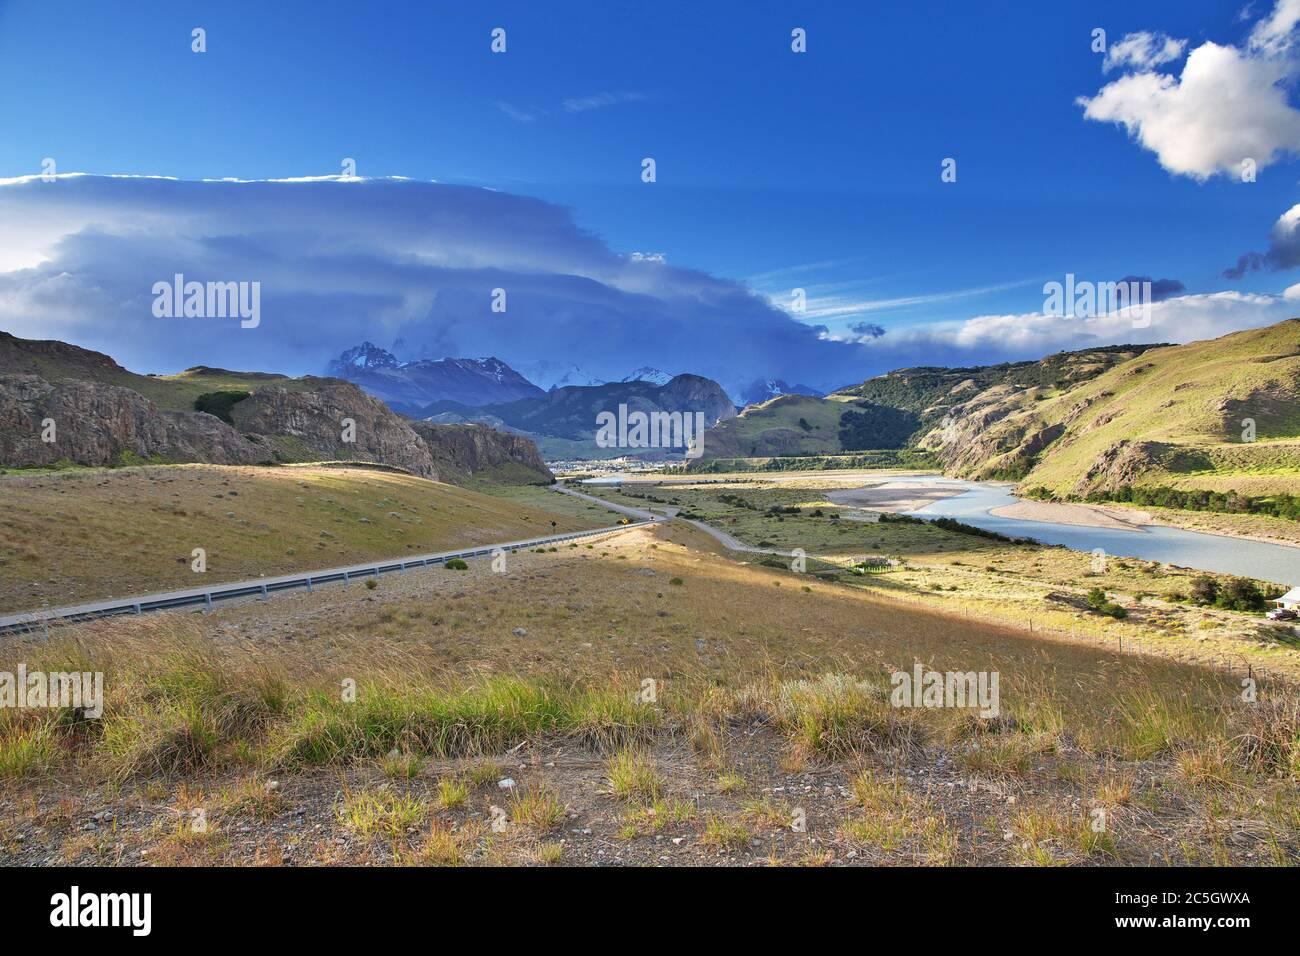 La vista sobre el Chalten, Patagonia, Argentina Foto de stock